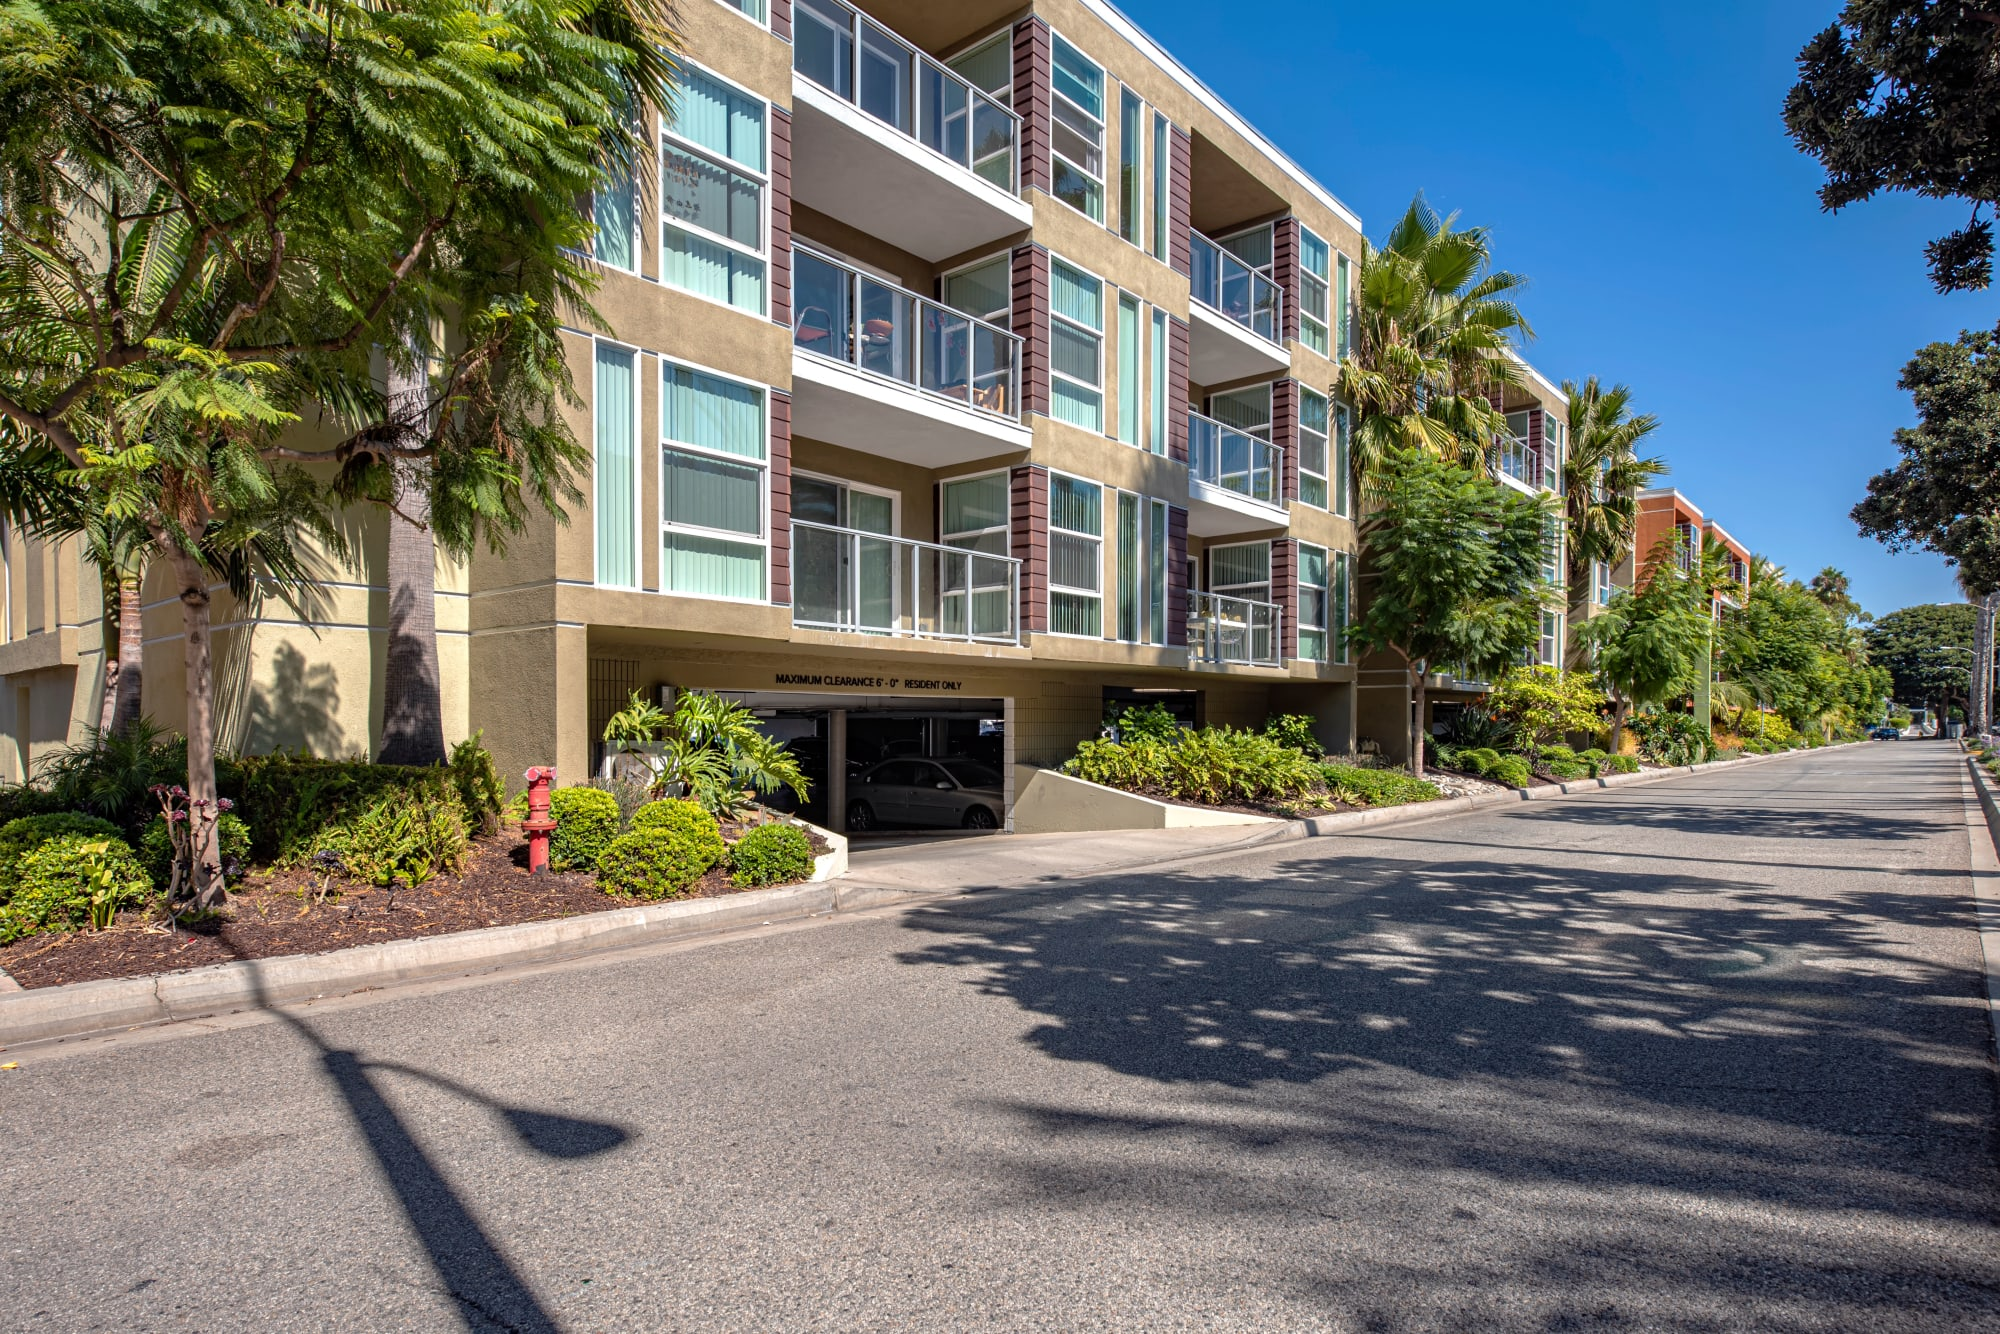 Access to a parking garage at Harborside Marina Bay Apartments in Marina del Rey, California